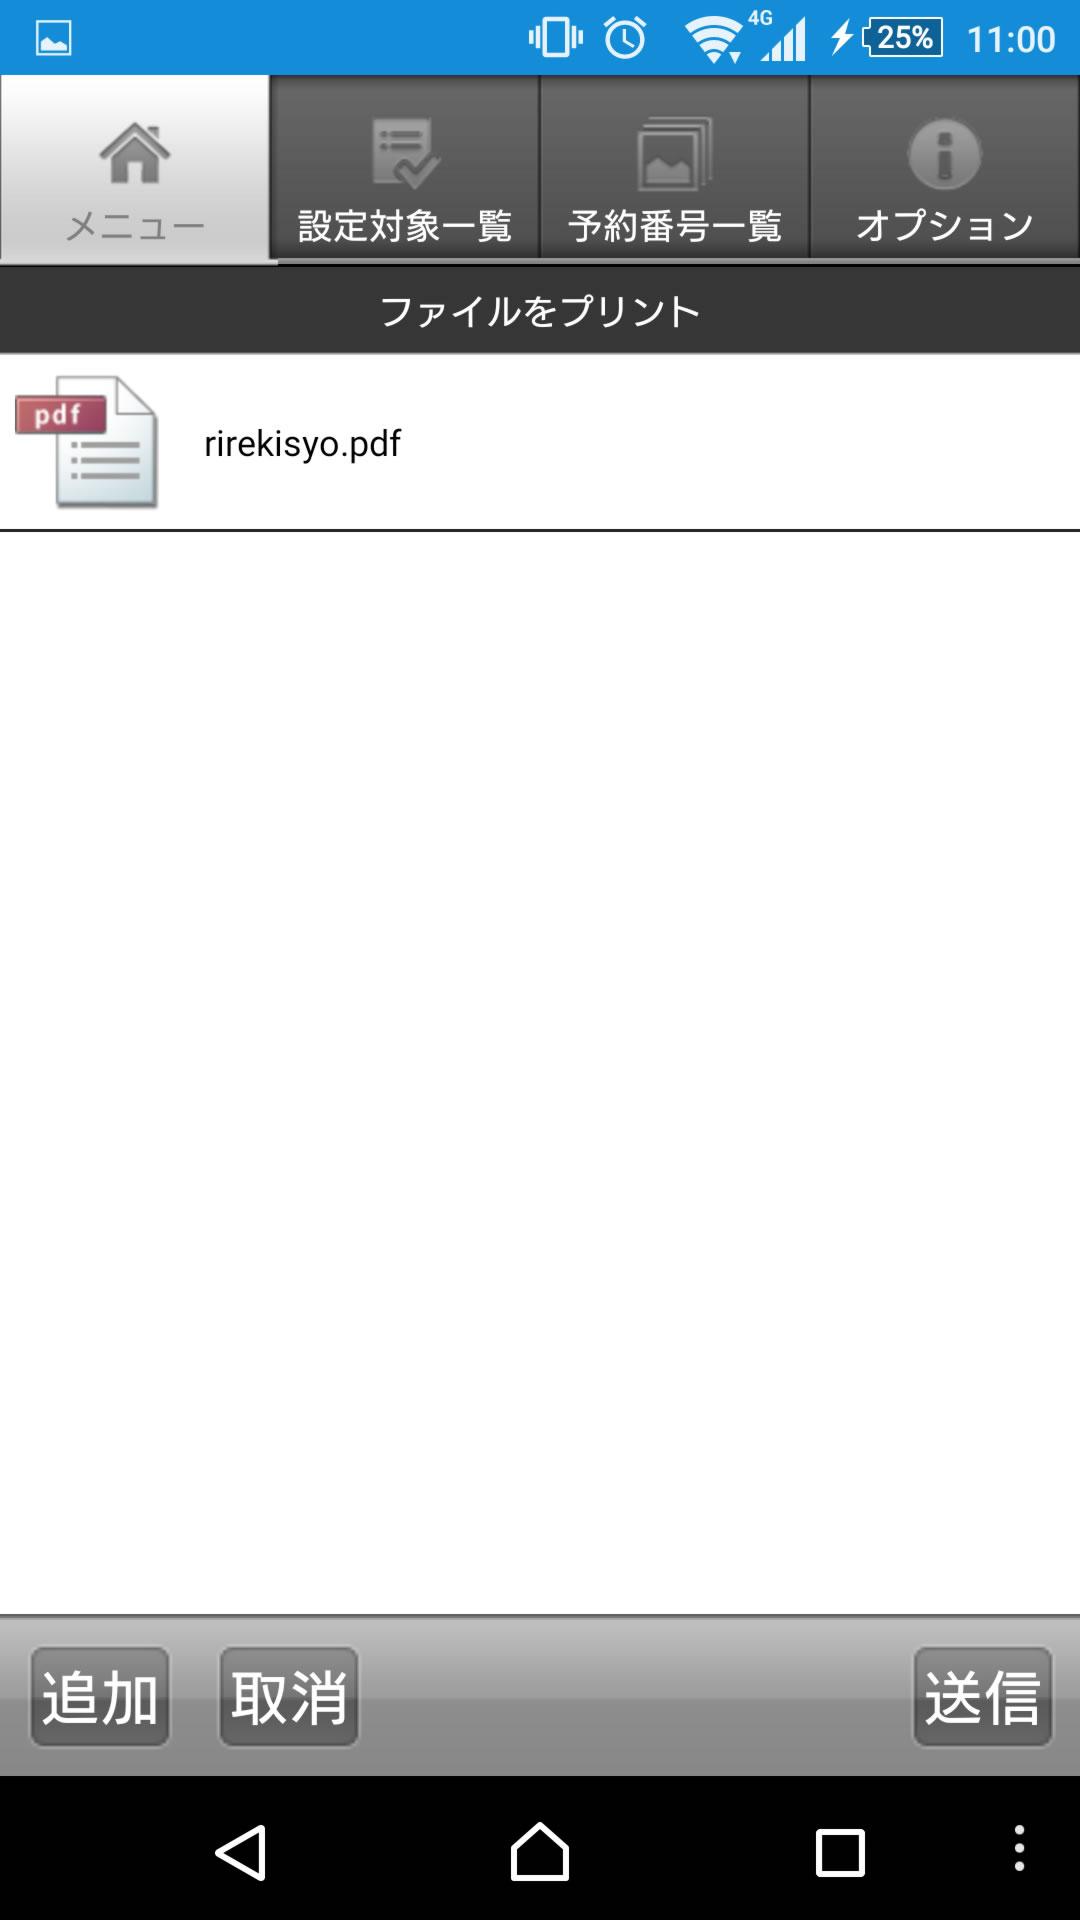 PDFファイルを選択 : pdfファイル 印刷 コンビニ : 印刷